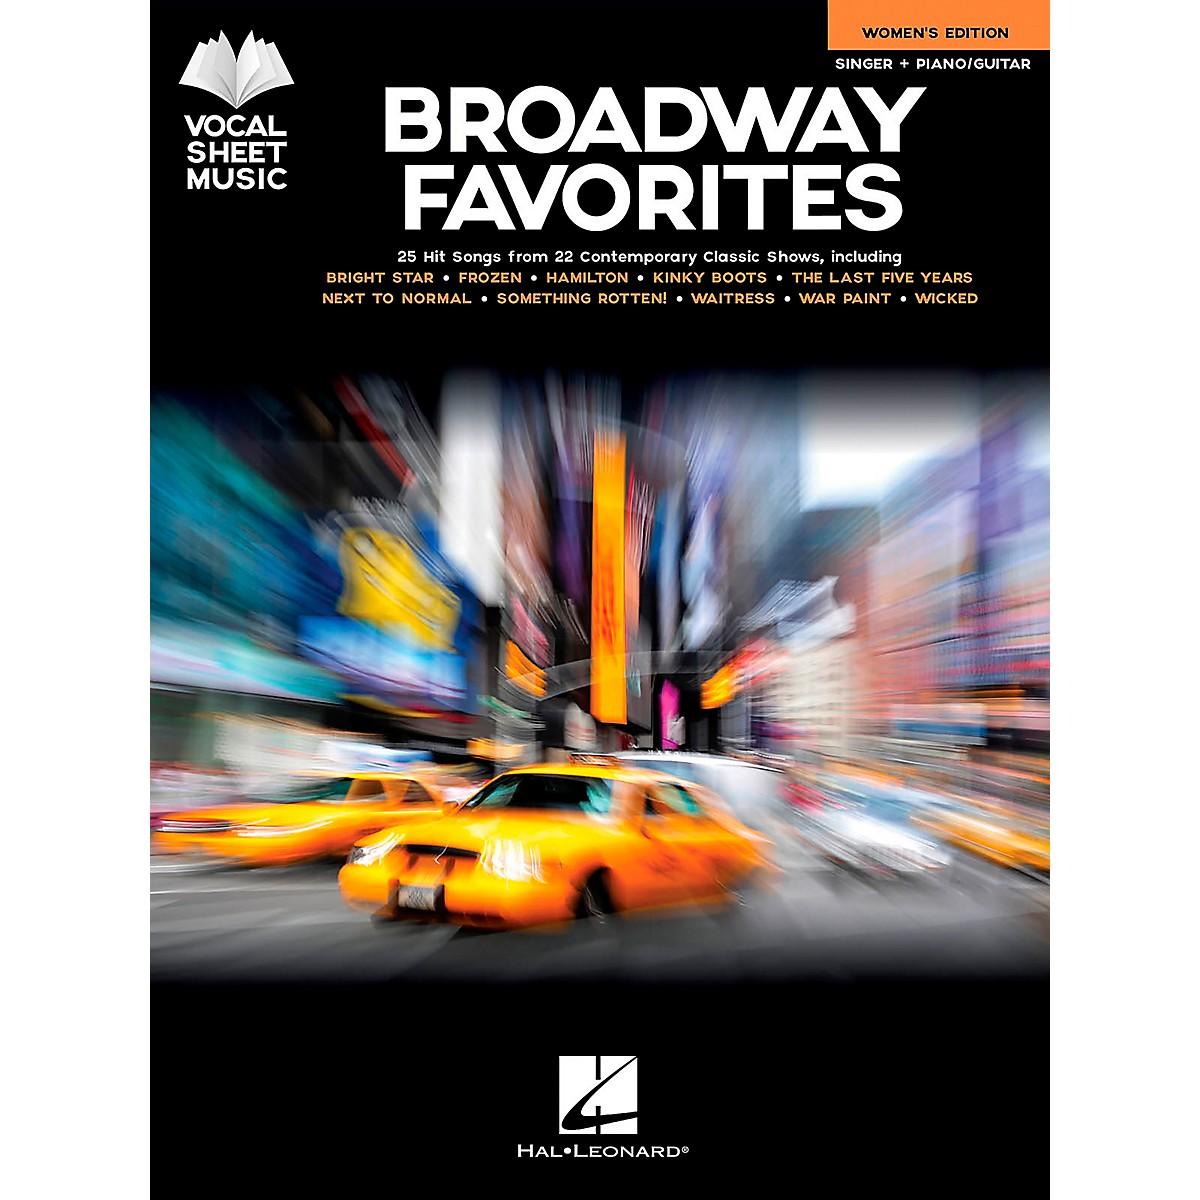 Hal Leonard Broadway Favorites - Women's Edition (Vocal Sheet Music) Singer + Piano/Guitar Songbook